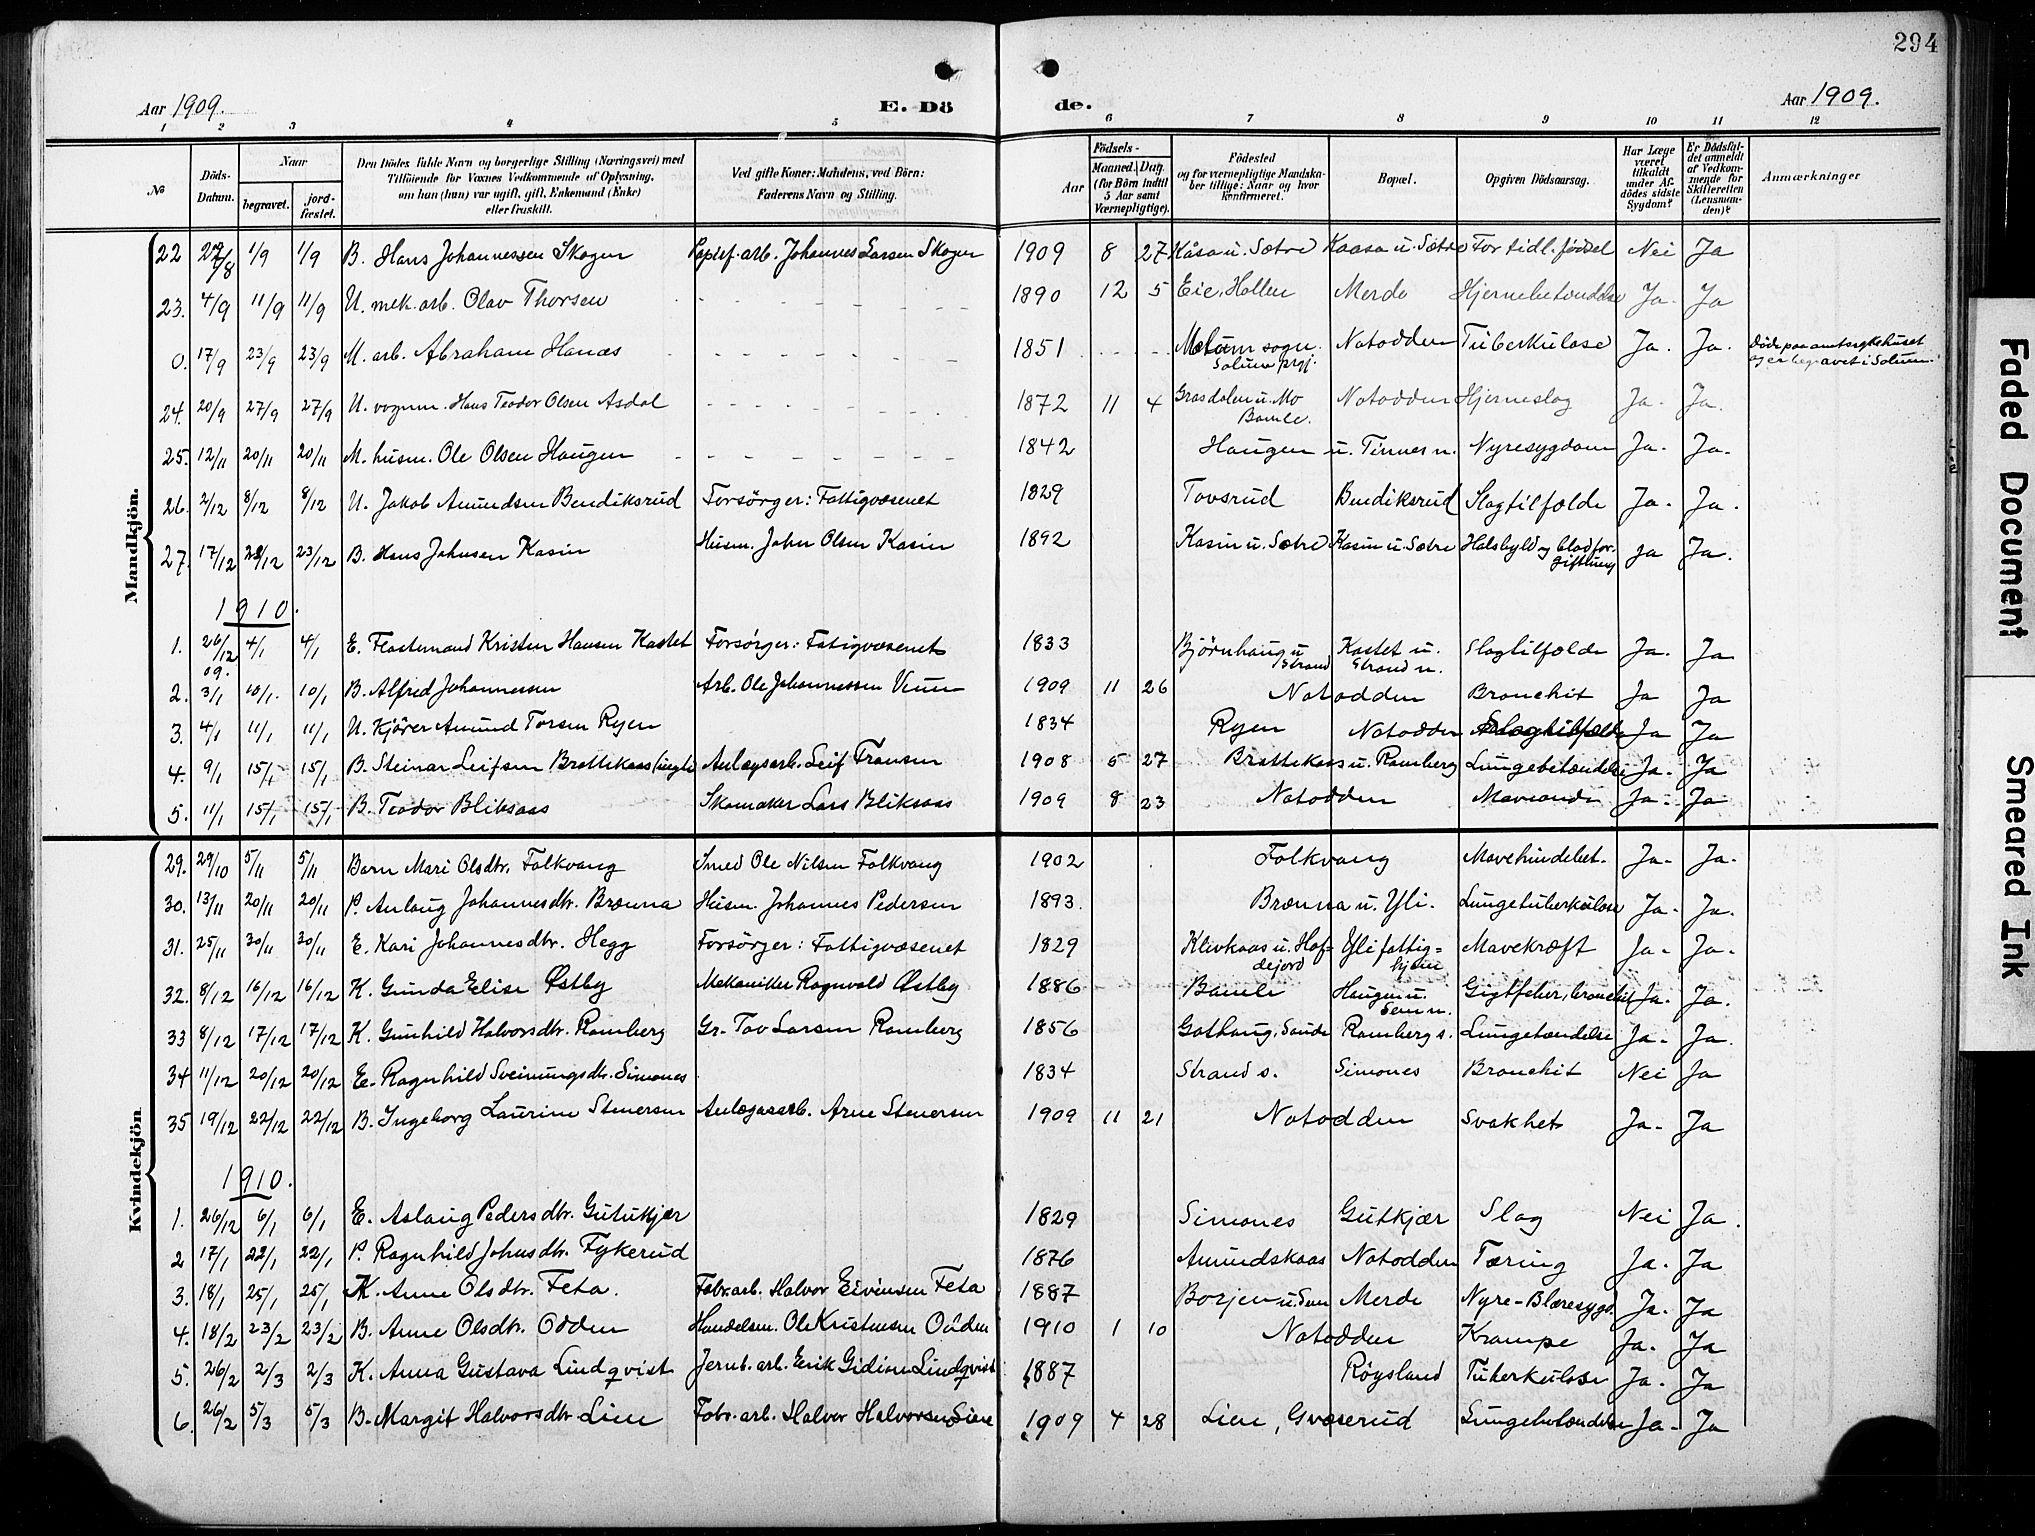 SAKO, Heddal kirkebøker, G/Ga/L0003: Klokkerbok nr. I 3, 1908-1932, s. 294